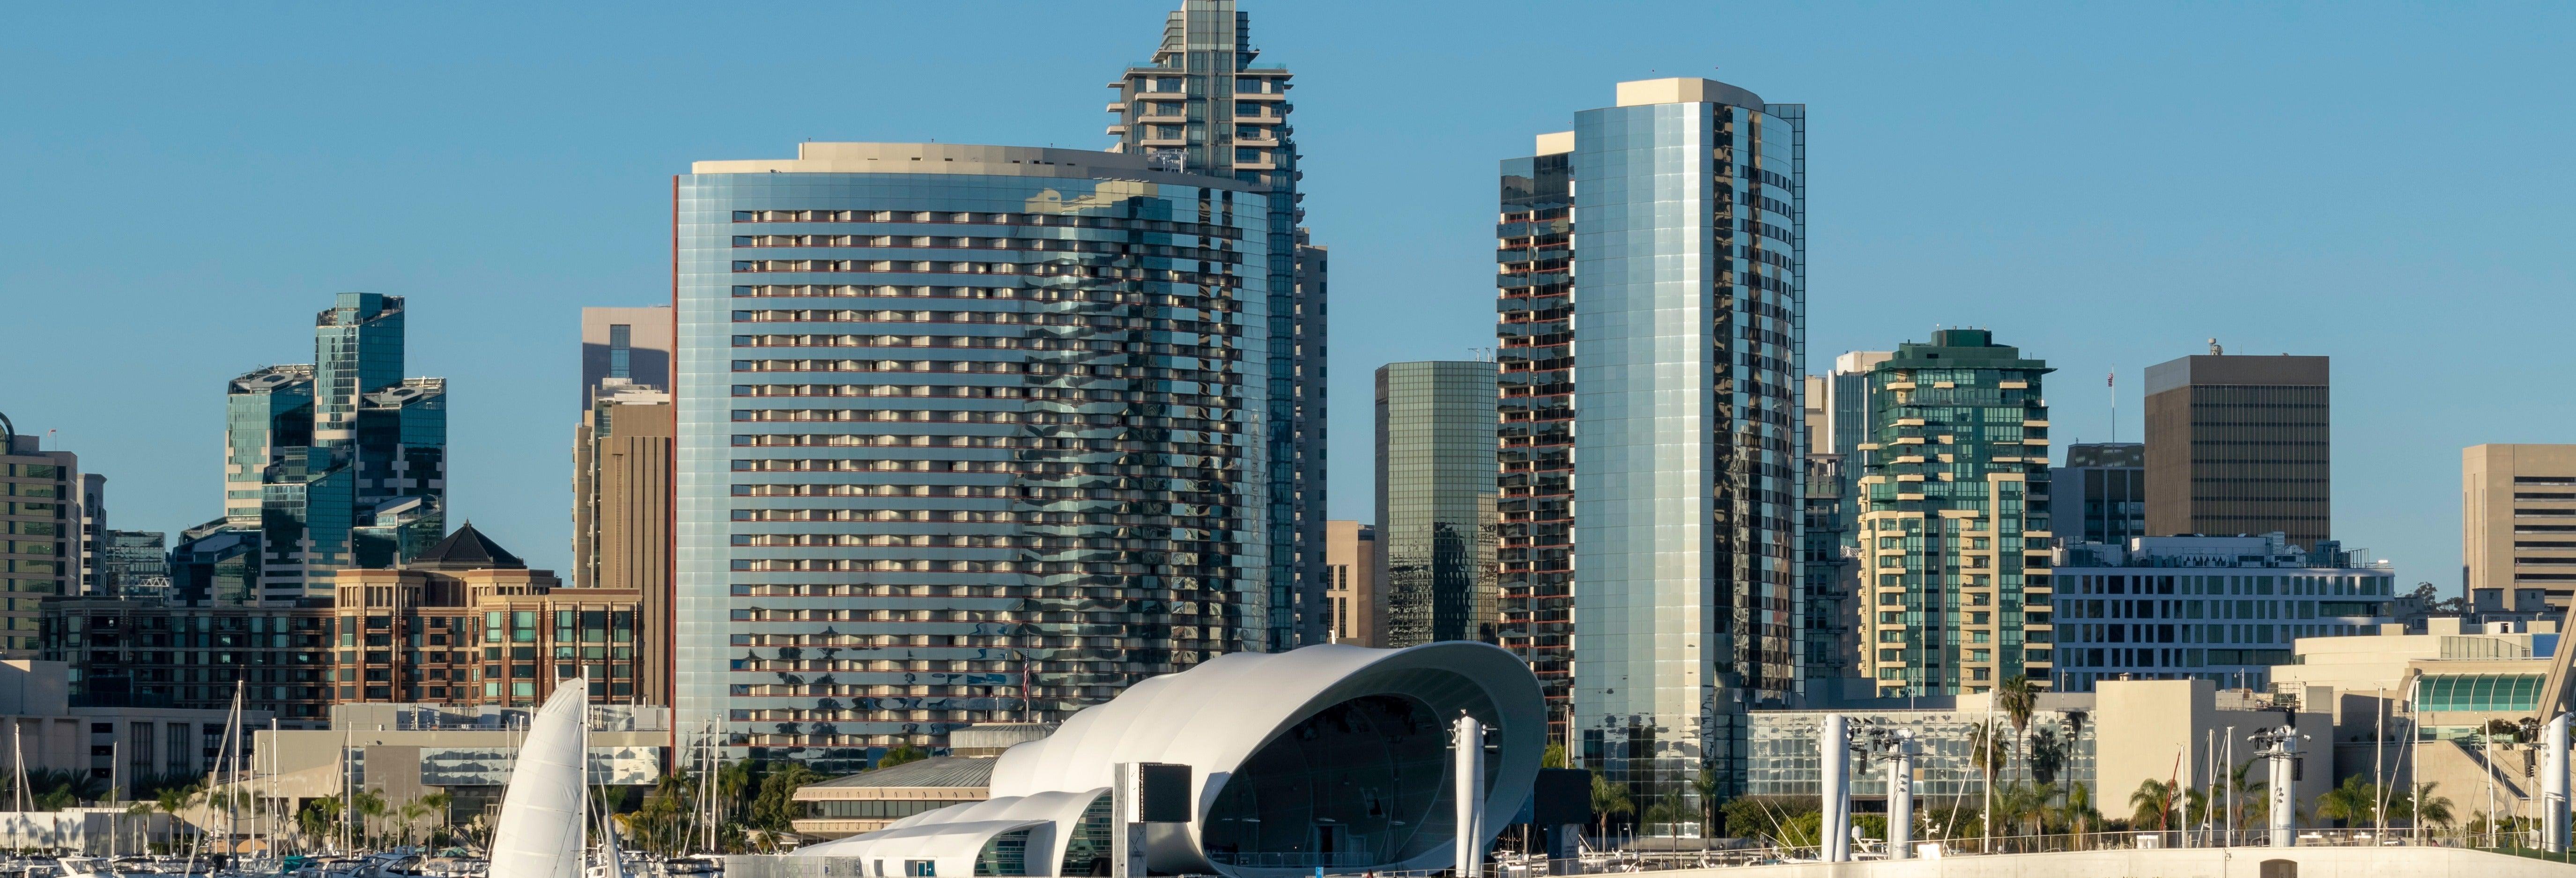 San Diego & La Jolla Day Trip